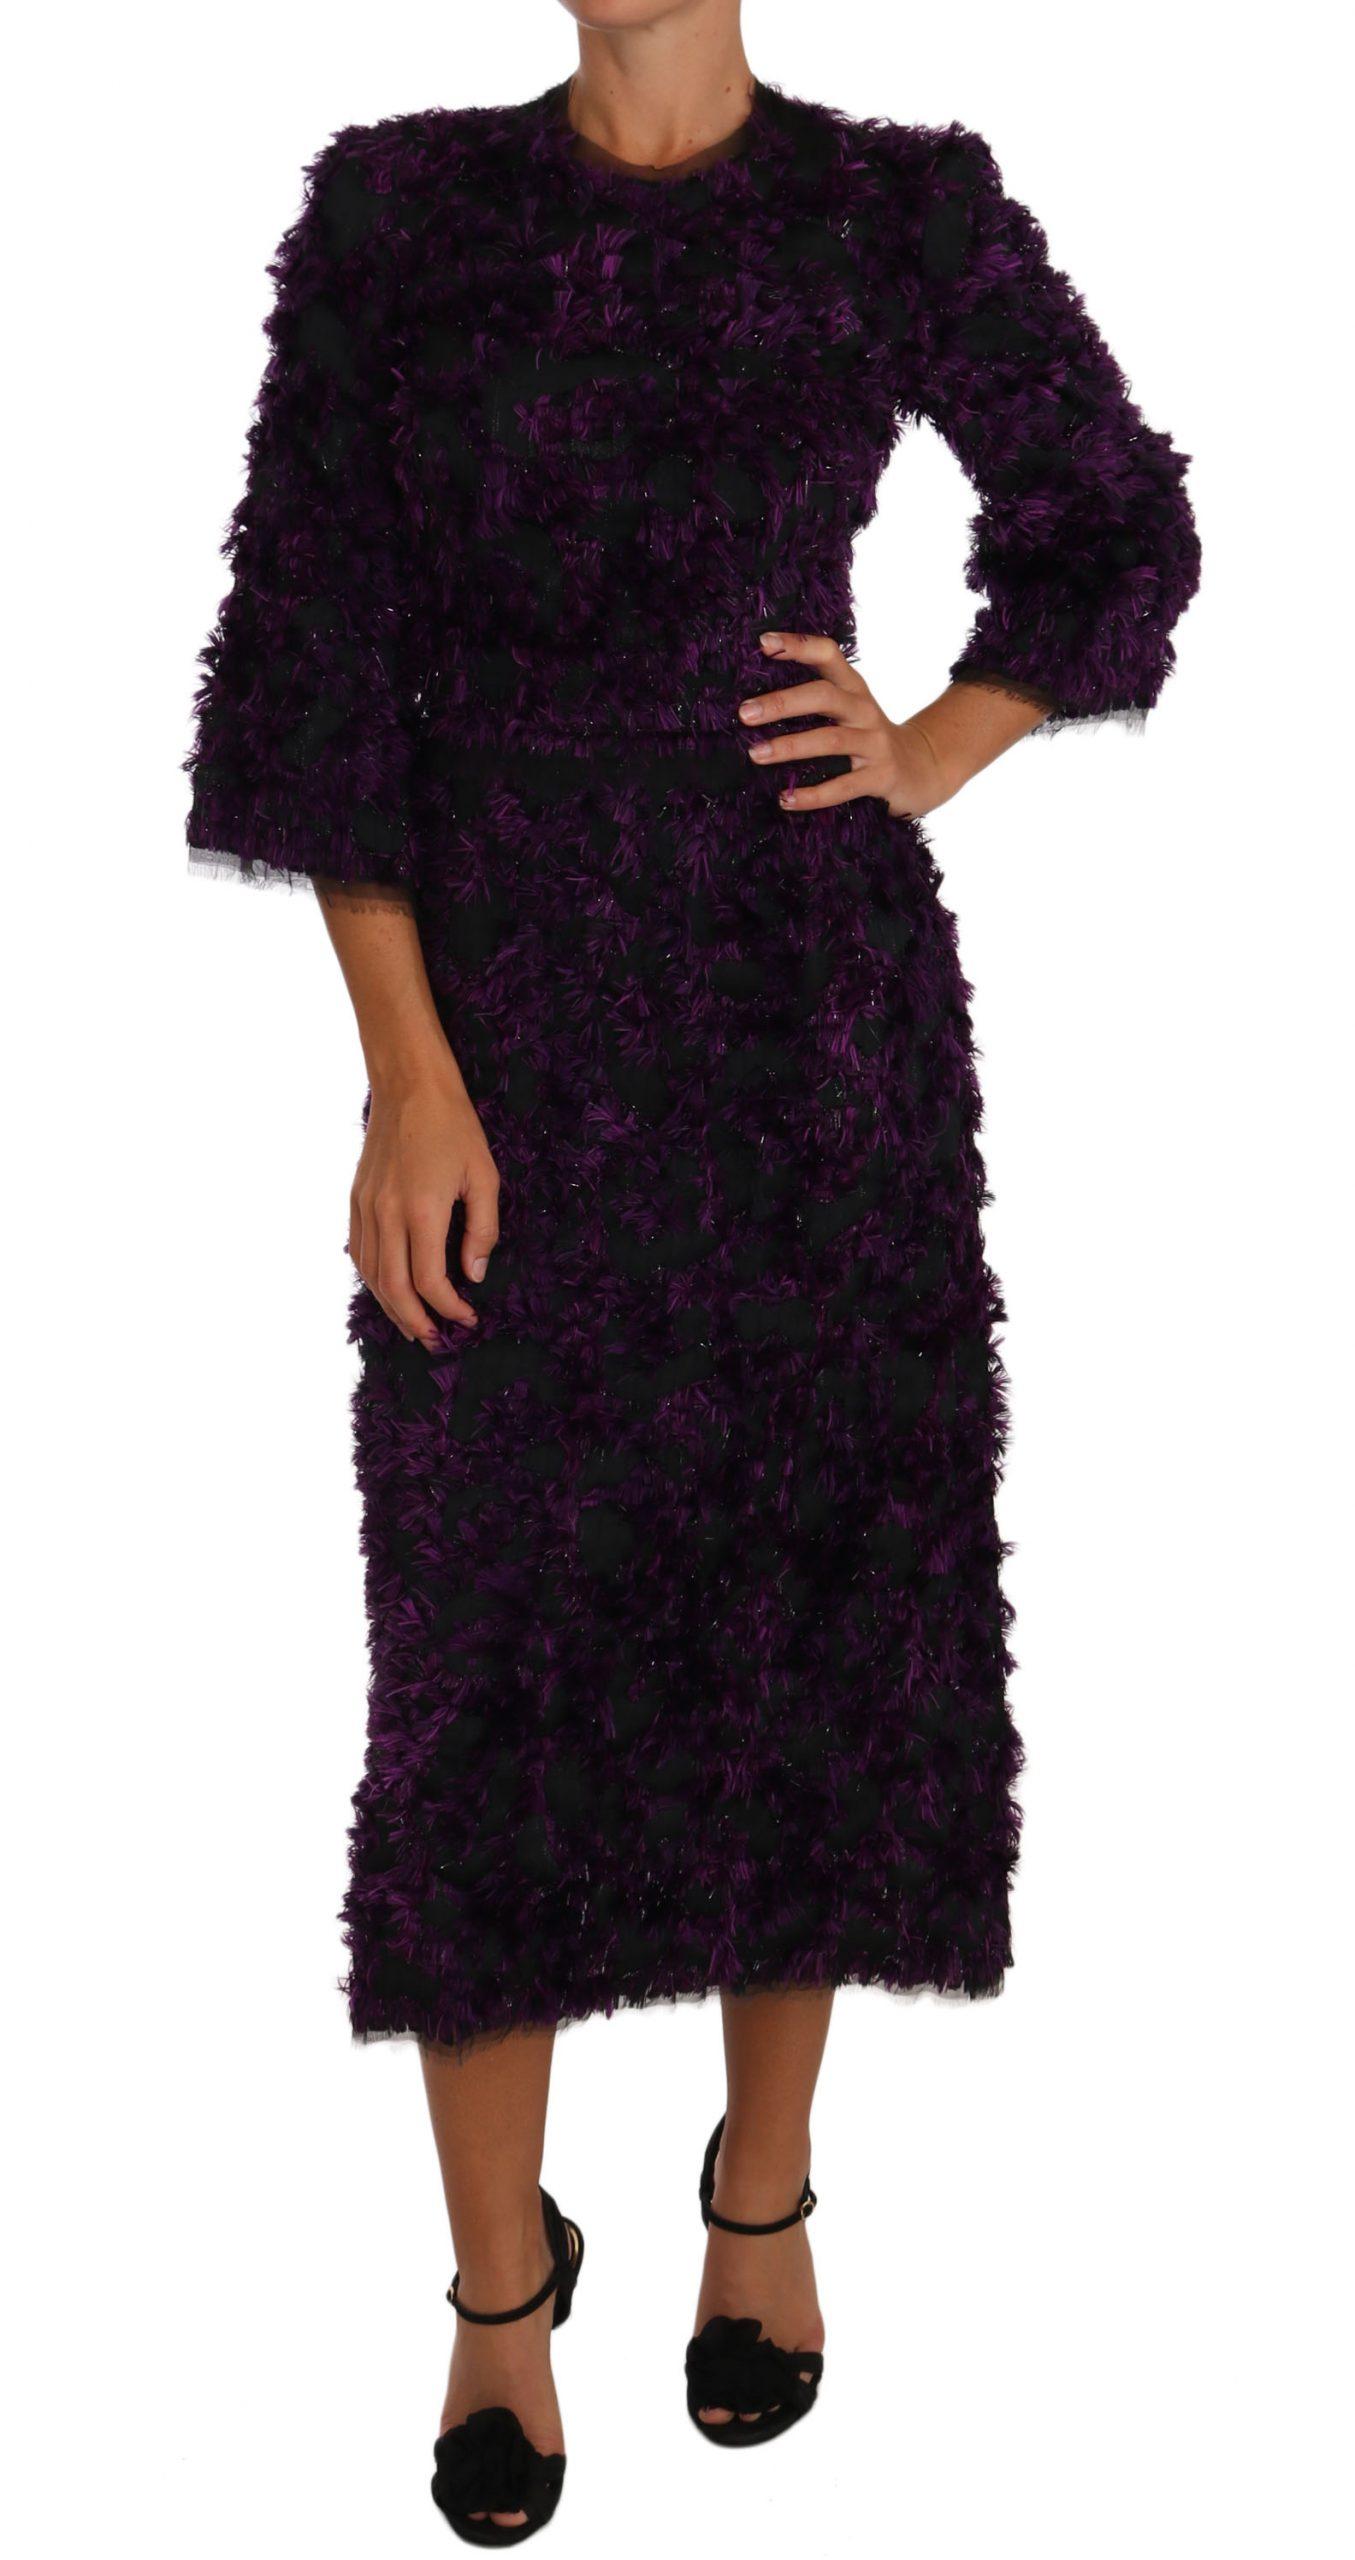 Dolce & Gabbana Women's Fringe Midi Sheath Dress Purple DR1441 - IT40|S